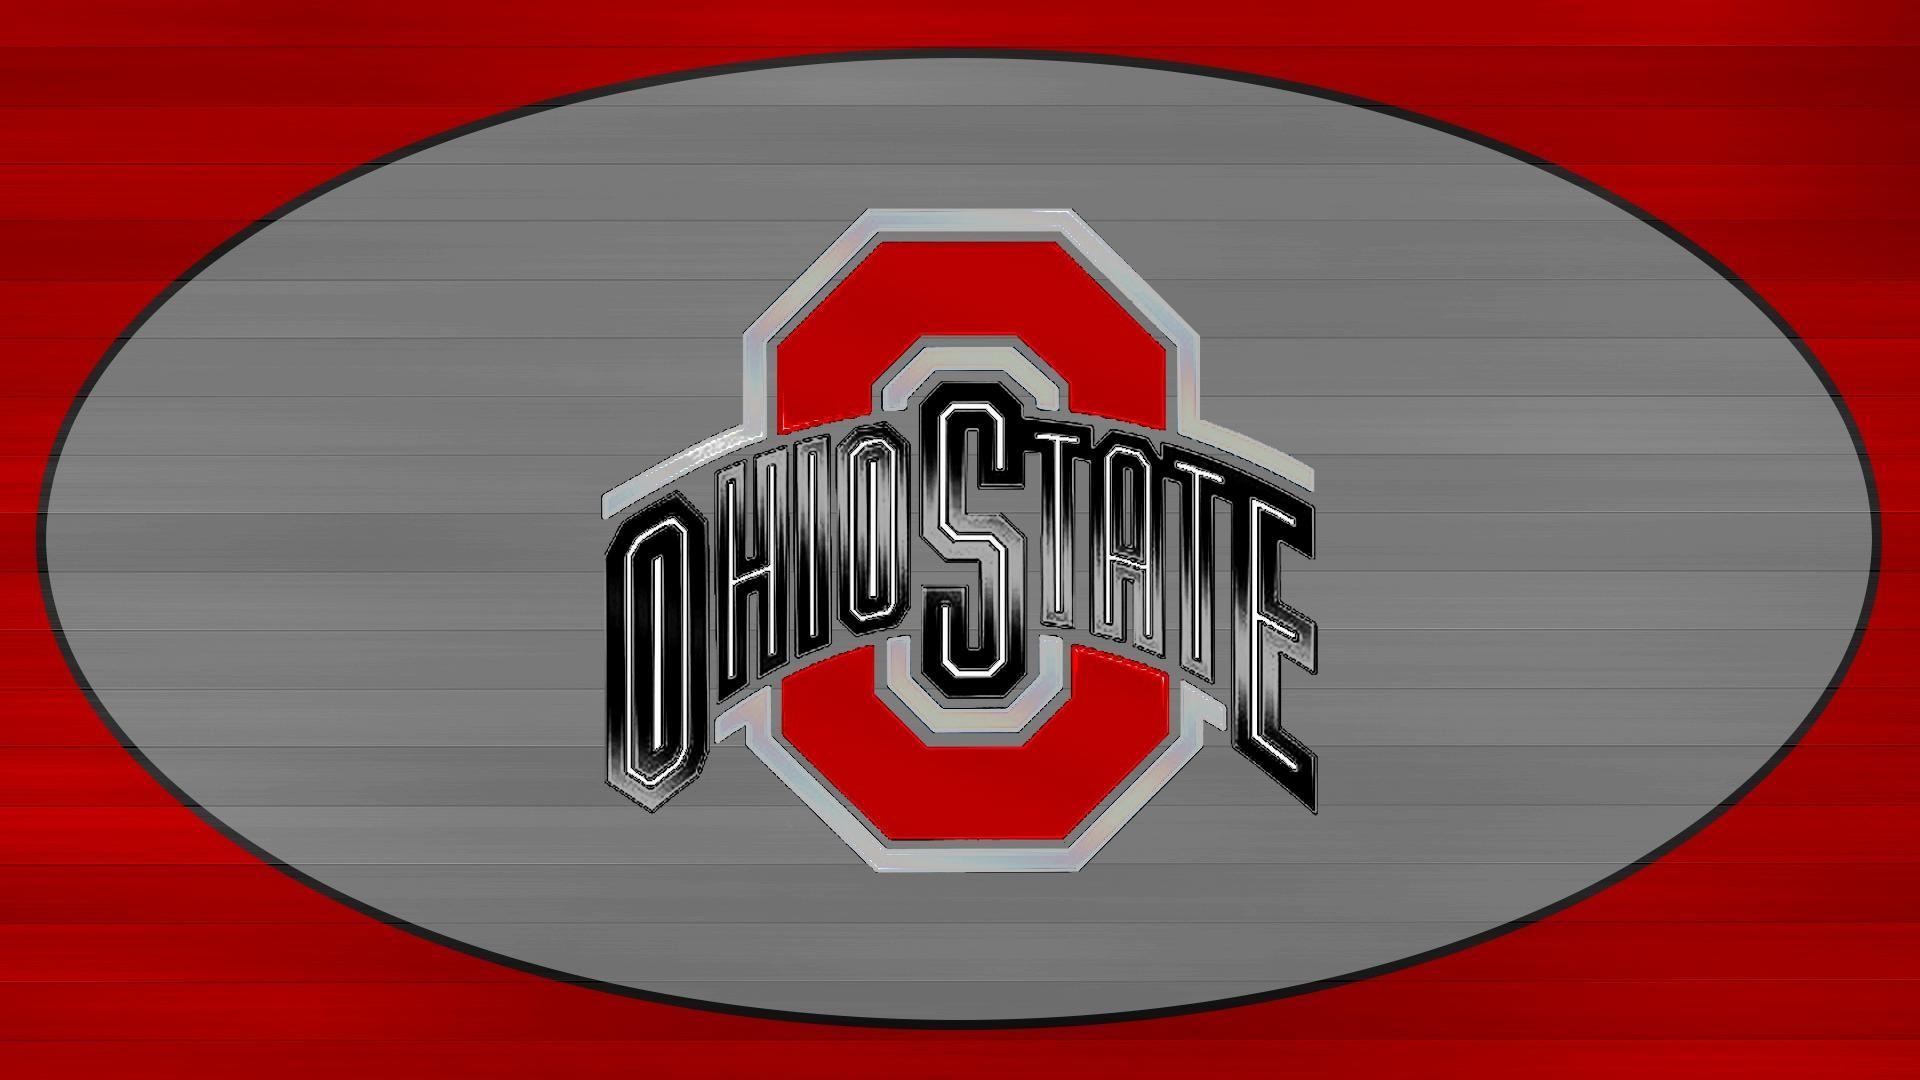 OSU-Ohio-State-Football-Fanpop-wallpaper-wp2008735